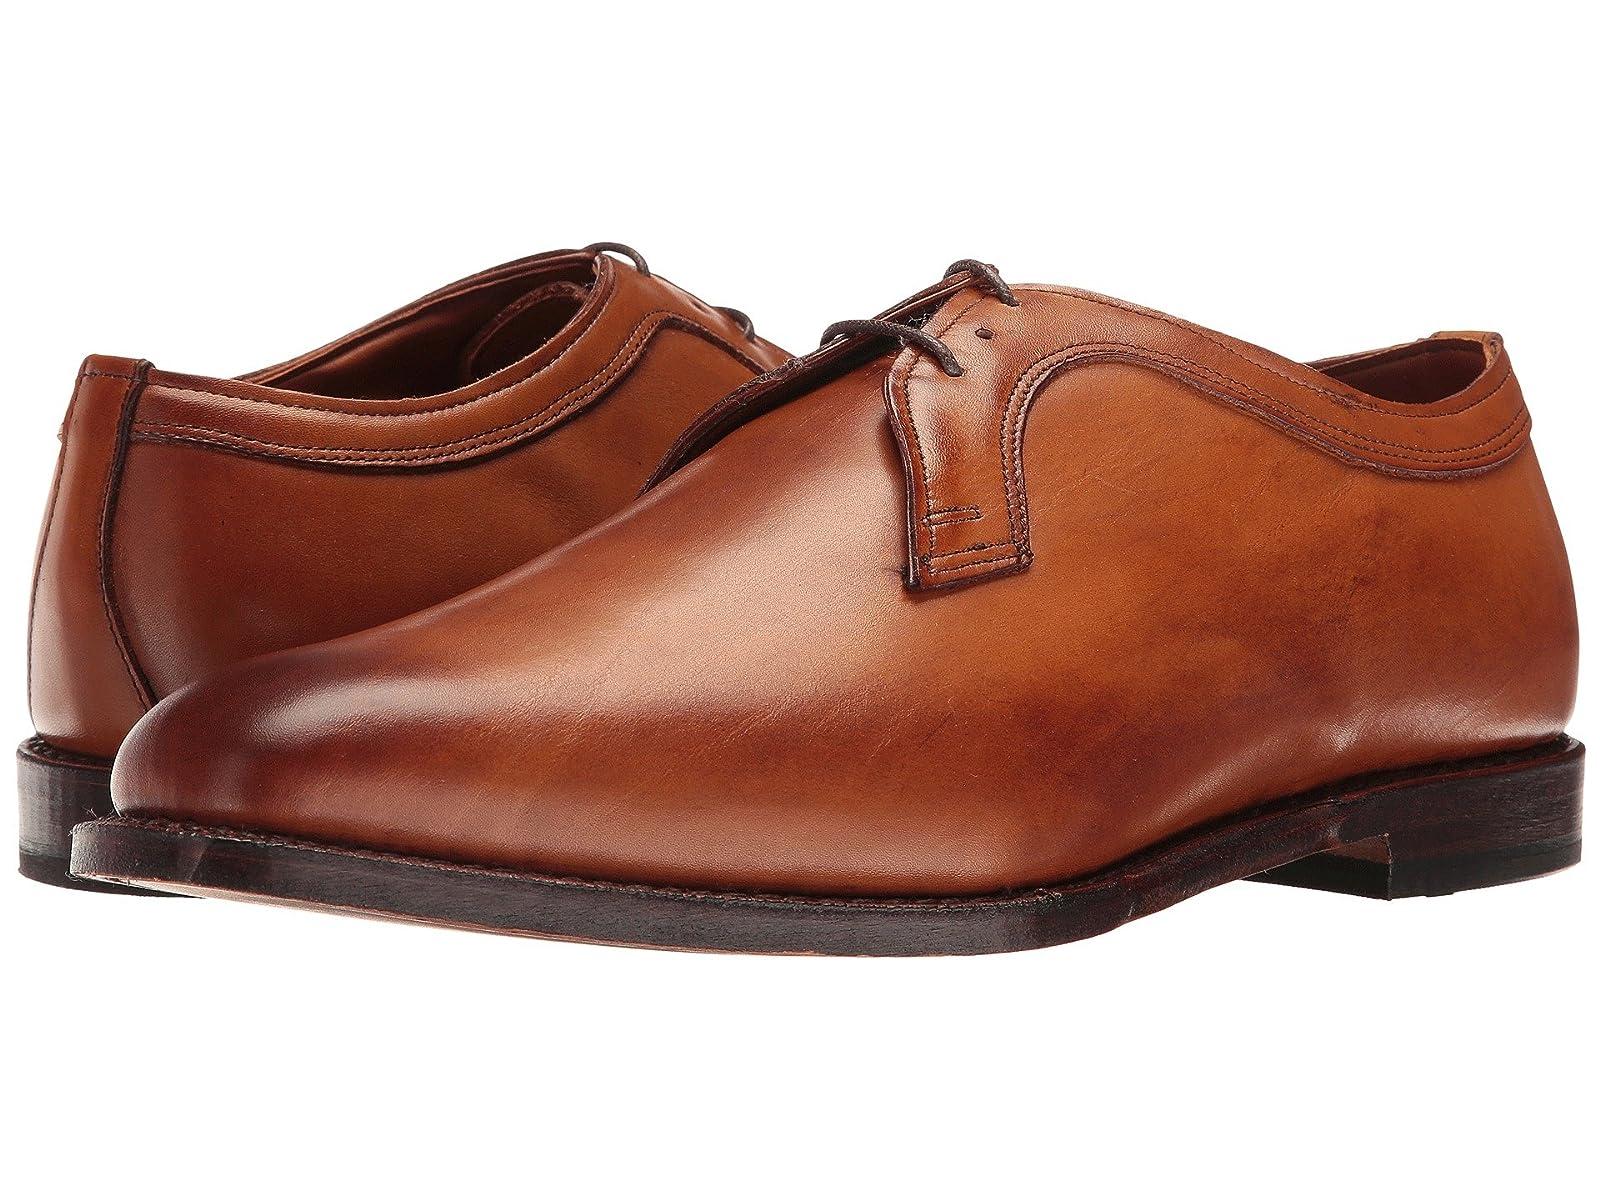 Allen Edmonds GranthamCheap and distinctive eye-catching shoes